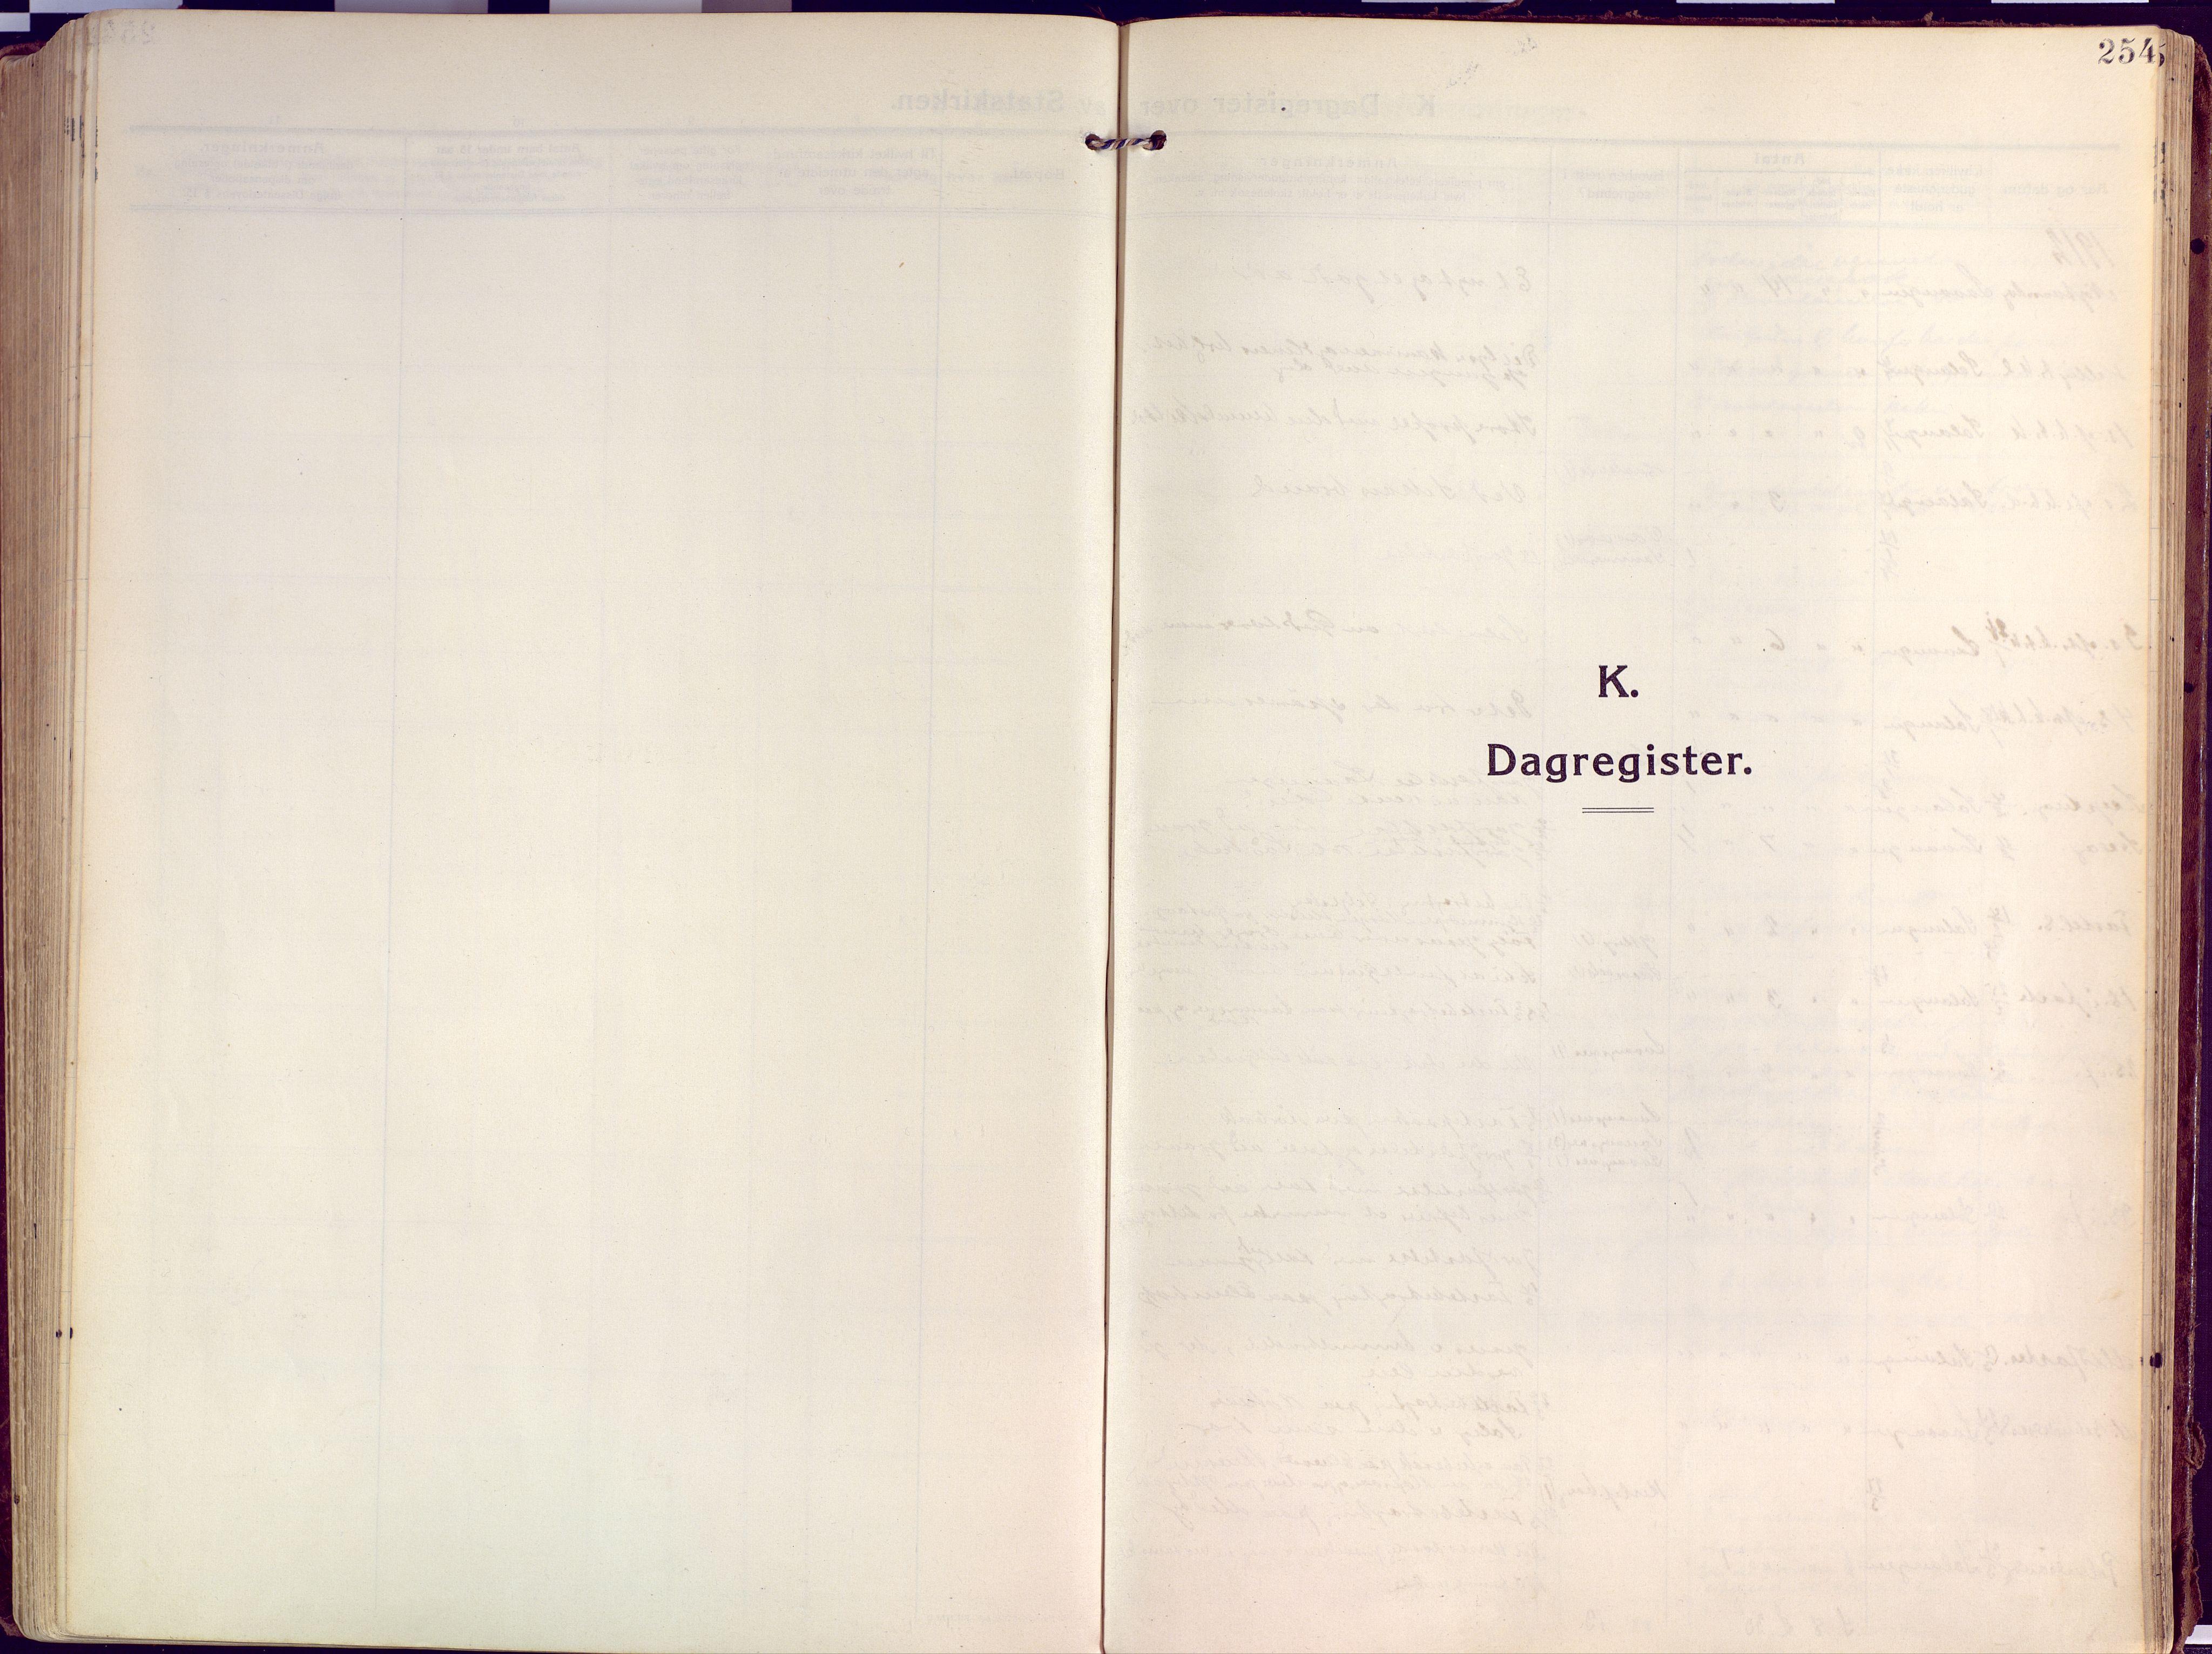 SATØ, Salangen sokneprestembete, Ministerialbok nr. 4, 1912-1927, s. 254